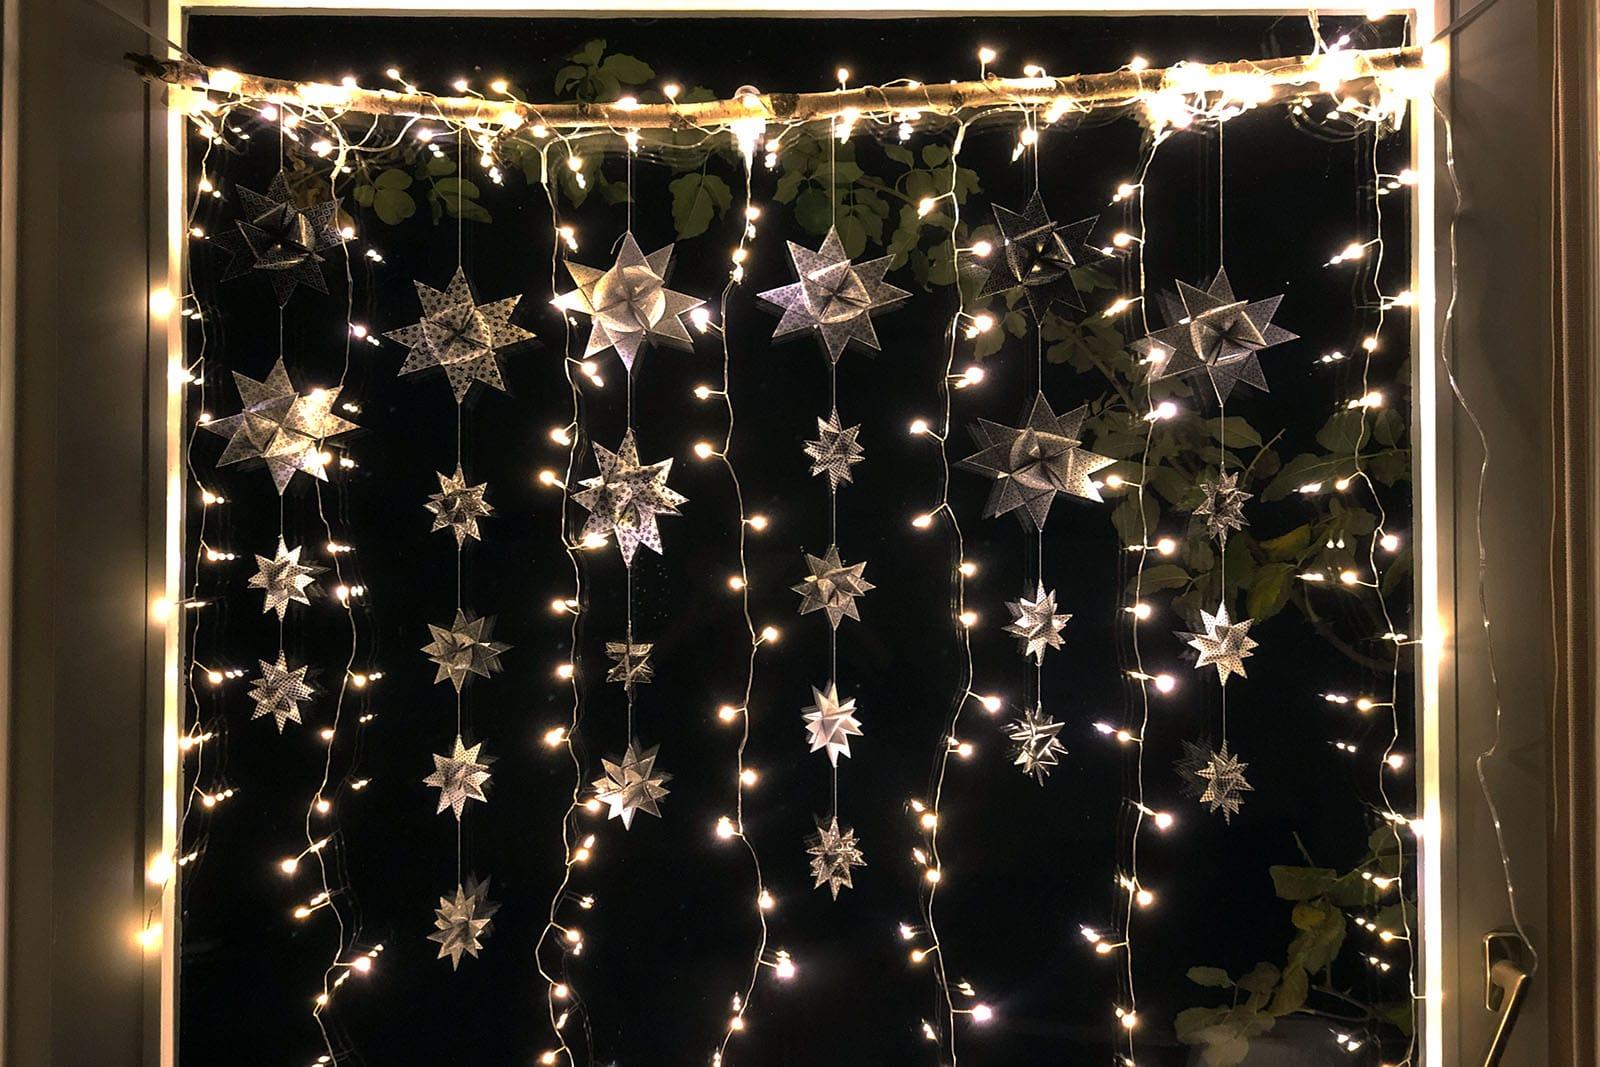 weihnachtsbeleuchtung f r 39 s fenster selber machen faminino. Black Bedroom Furniture Sets. Home Design Ideas